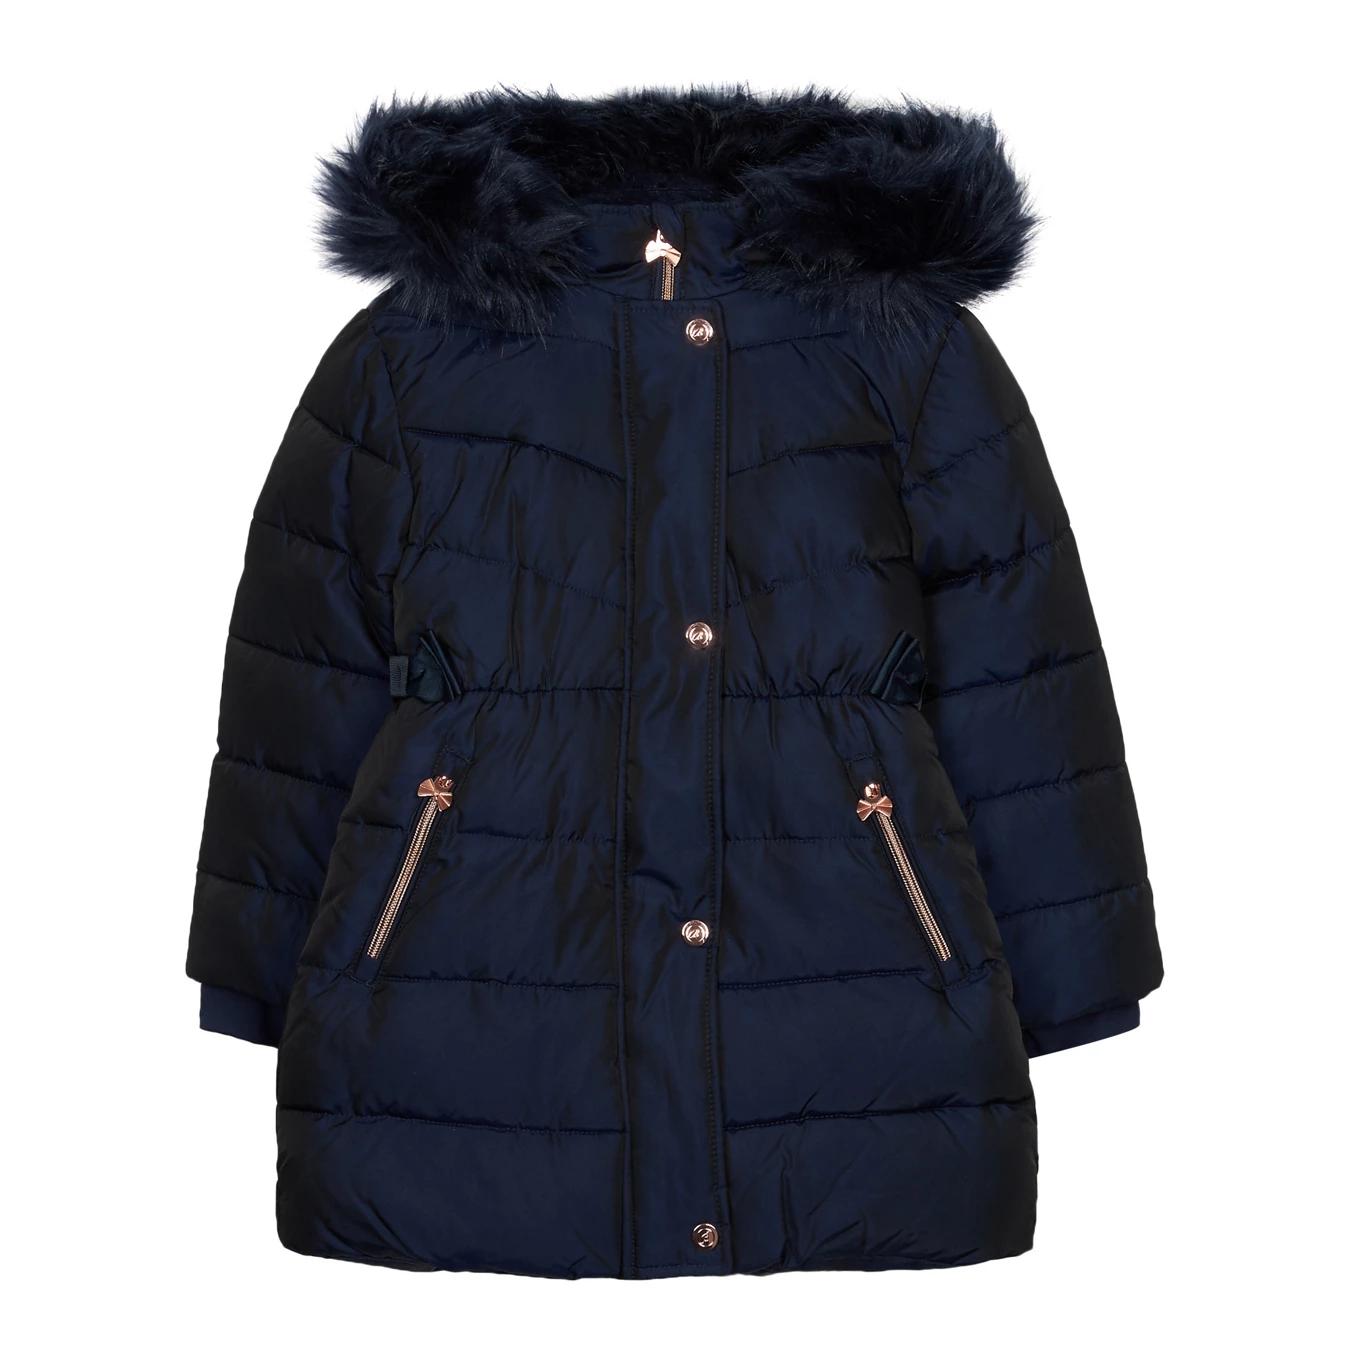 30% of school jackets/coats @ Debenhams e.g. Ted Baker Girls' Navy Padded Shower Resistant Coat from £45.50-£49